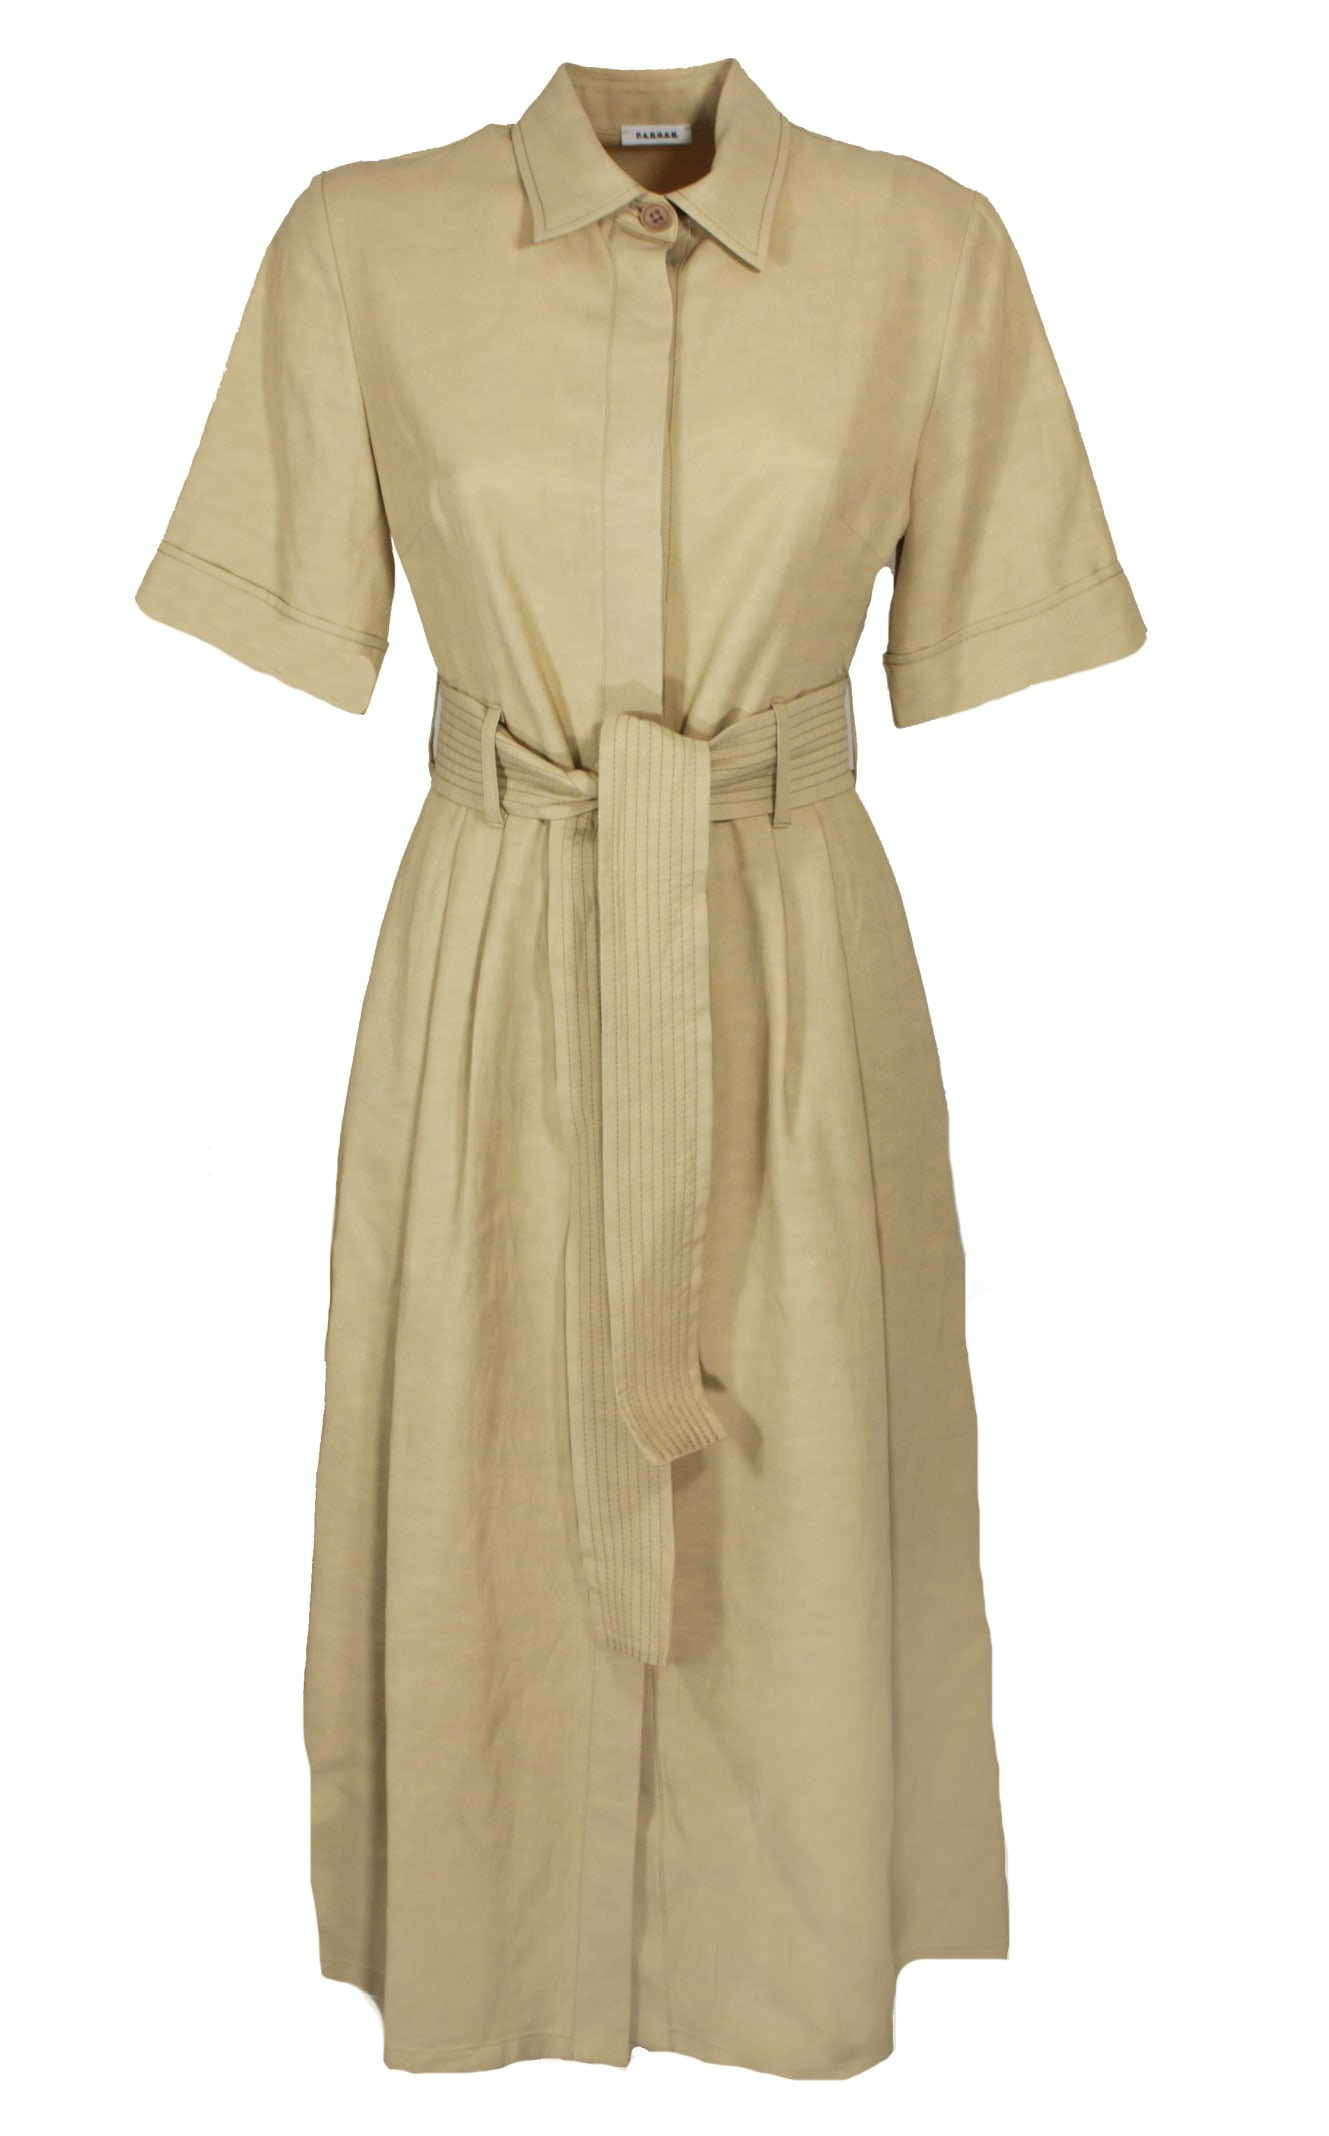 P.a.r.o.s.h. BELTED LINEN DRESS